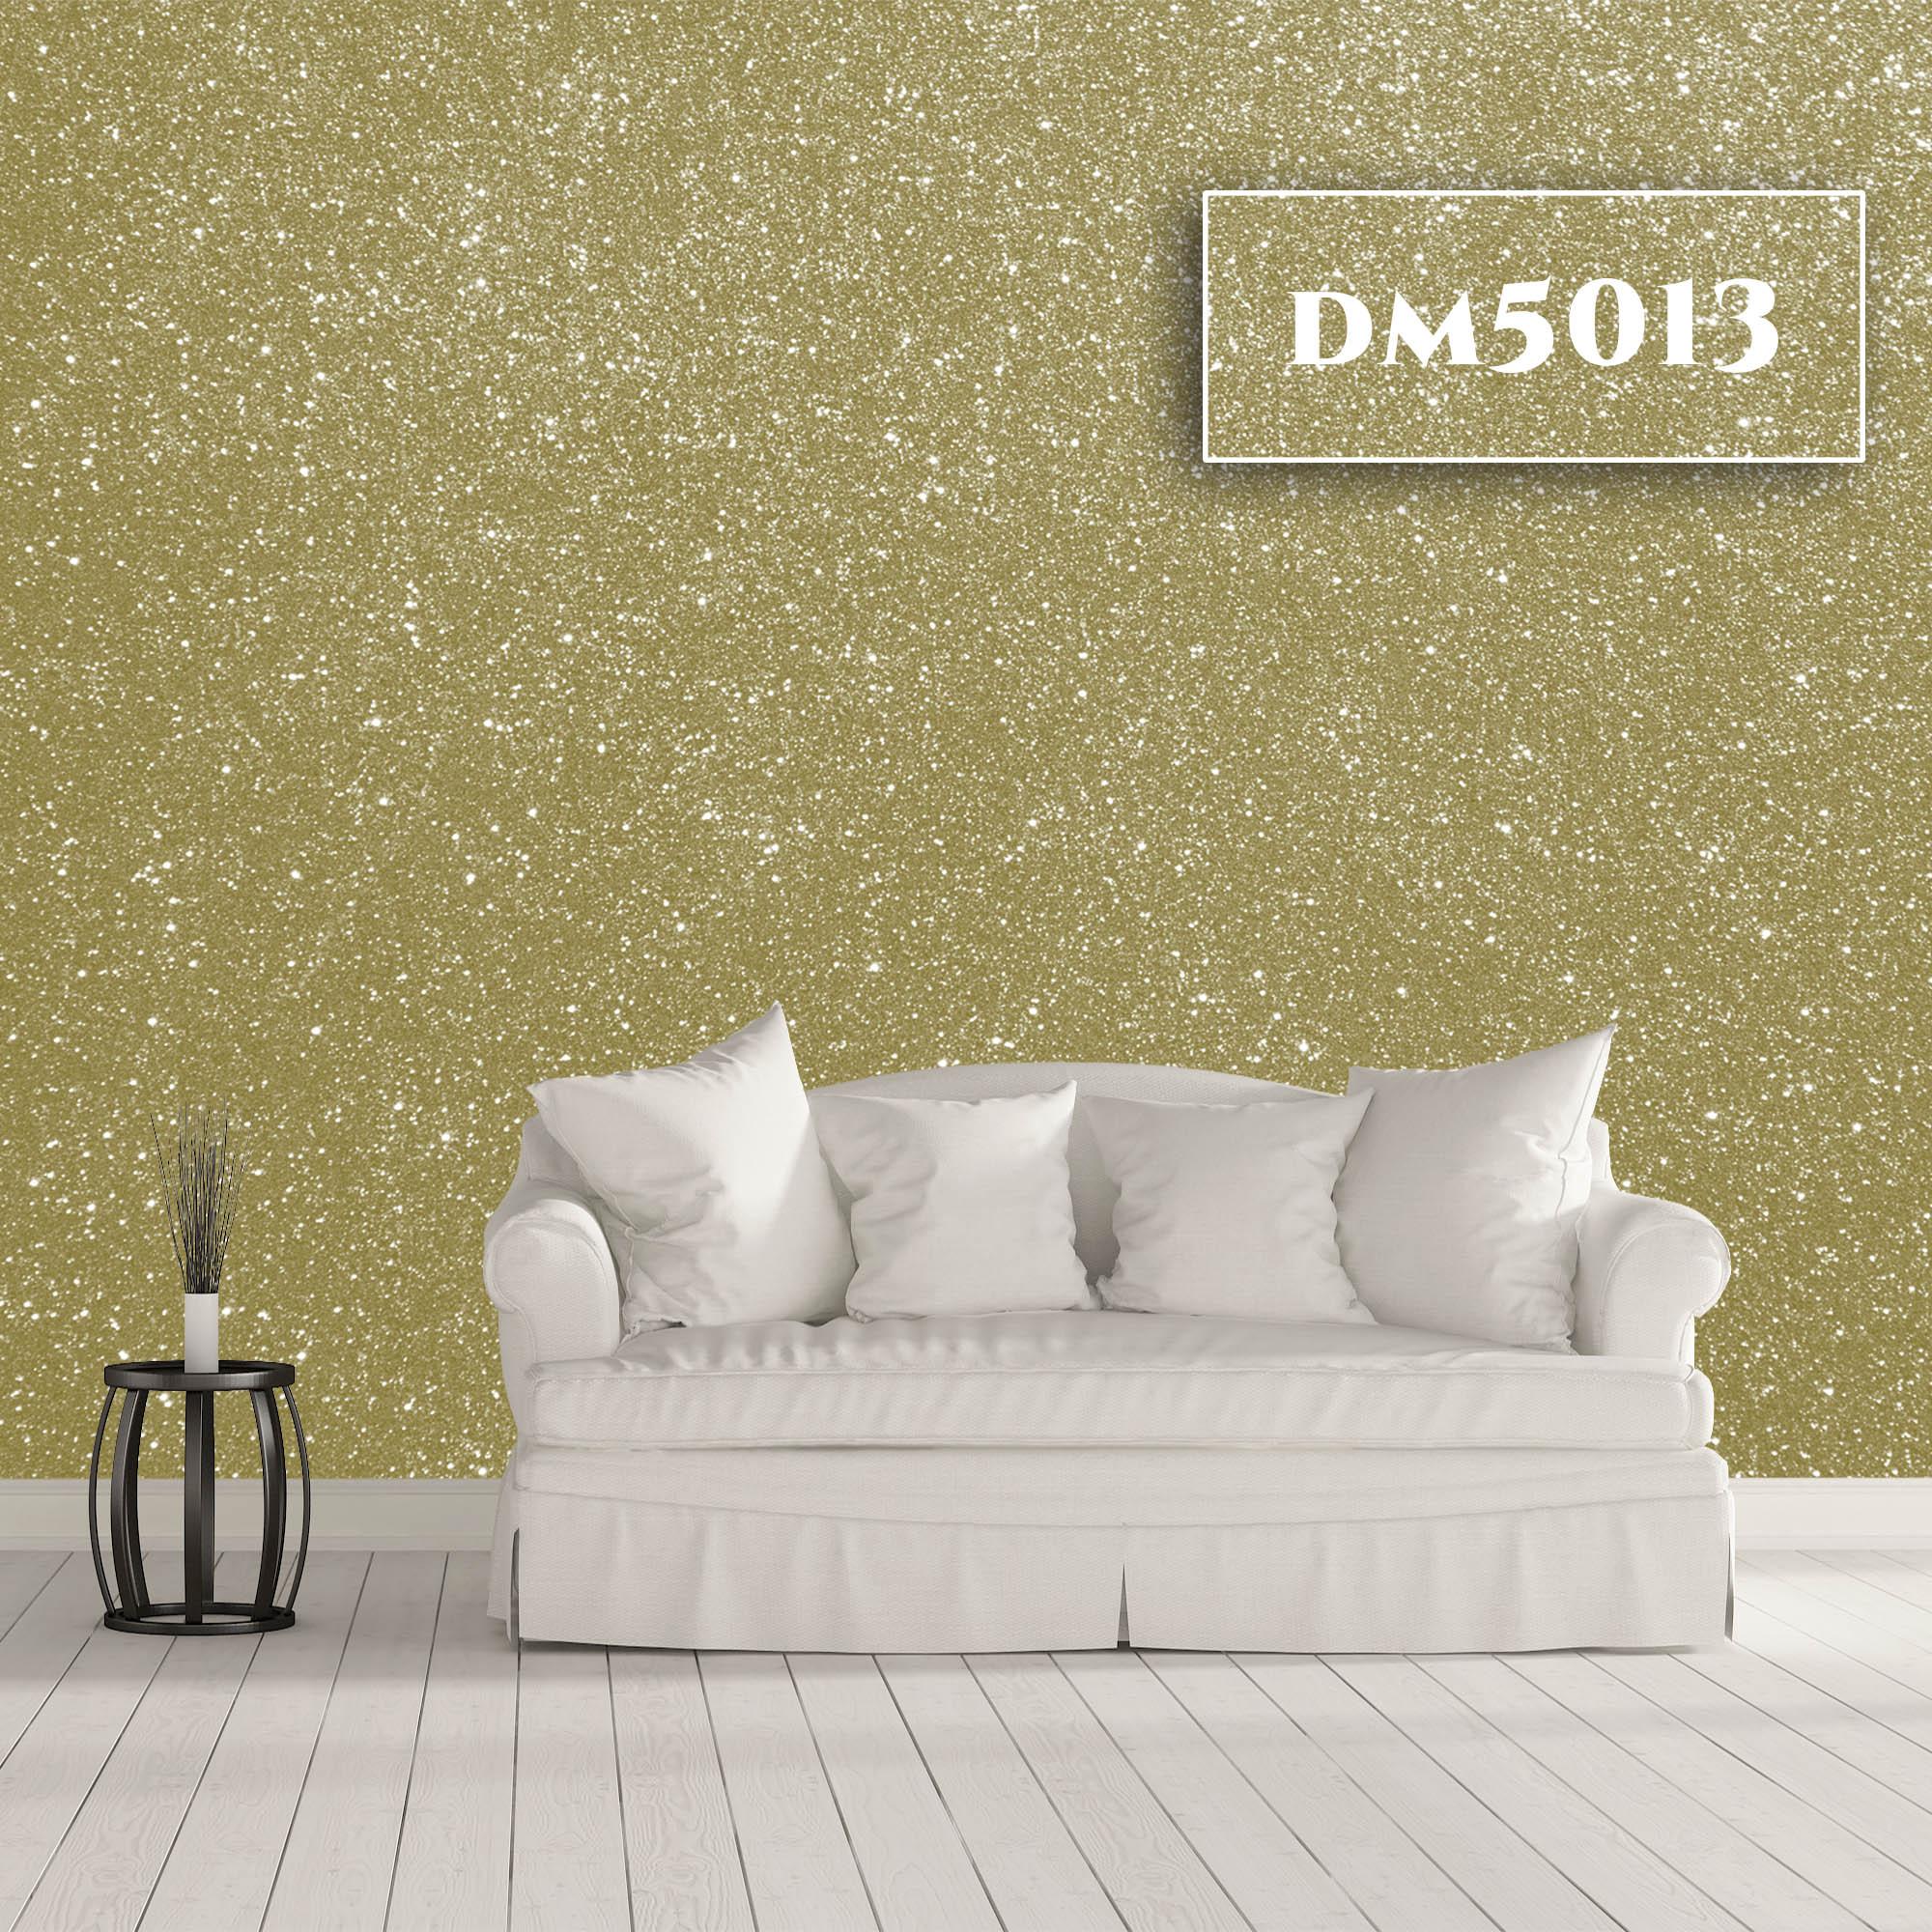 DM5013